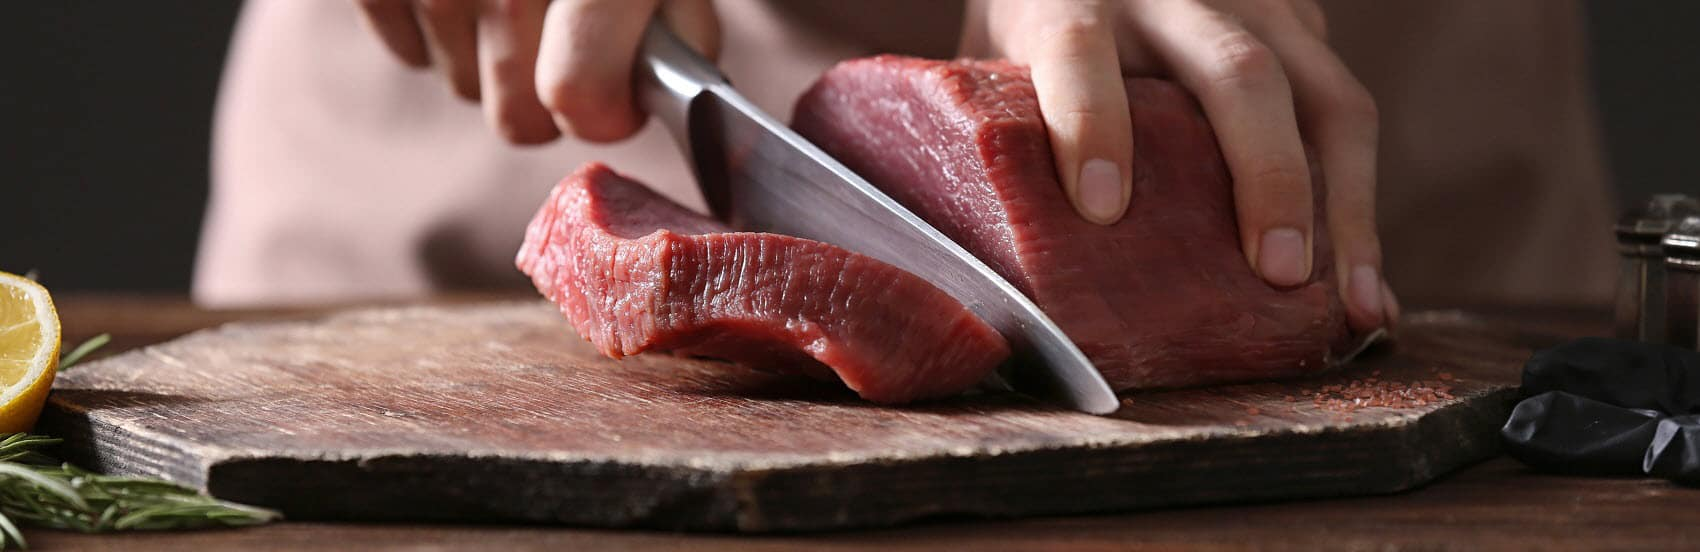 Butchering Meat